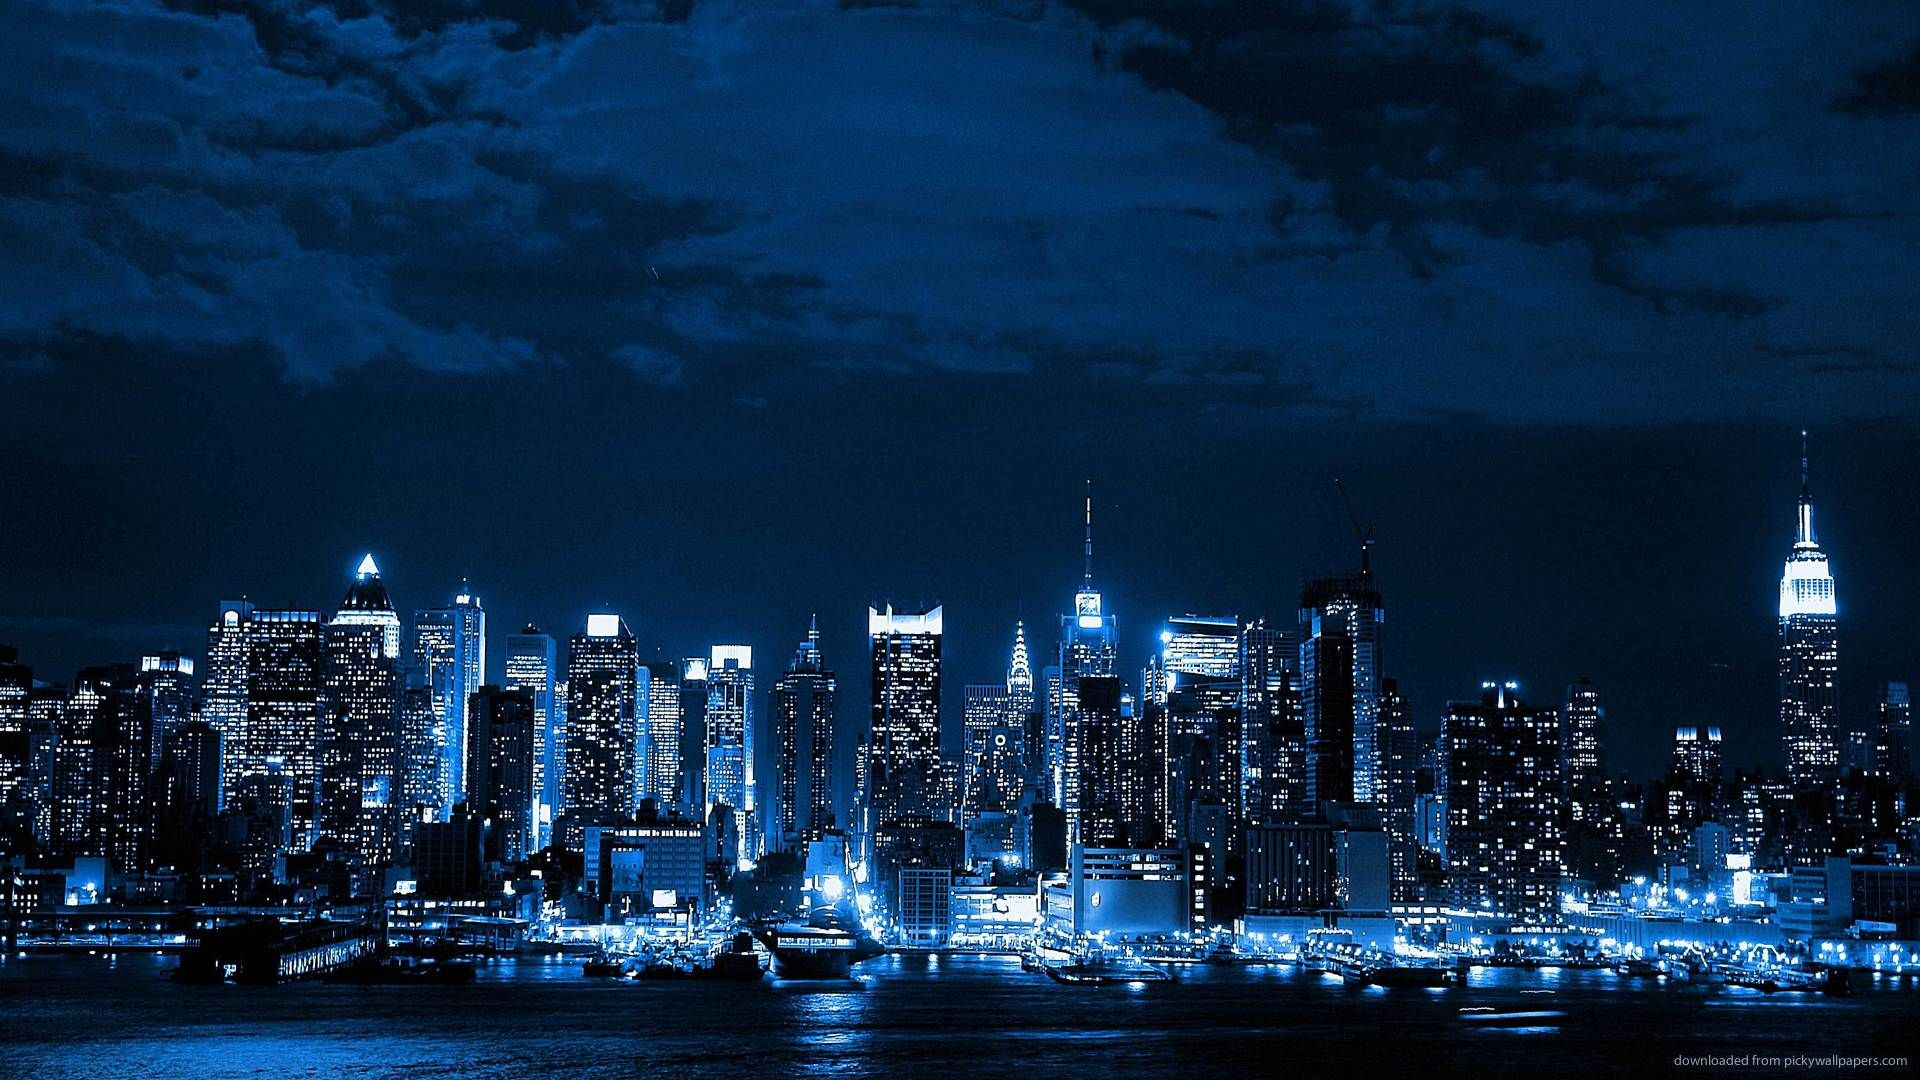 Blue Skyline Cityscape Wallpaper City Wallpaper Blue City